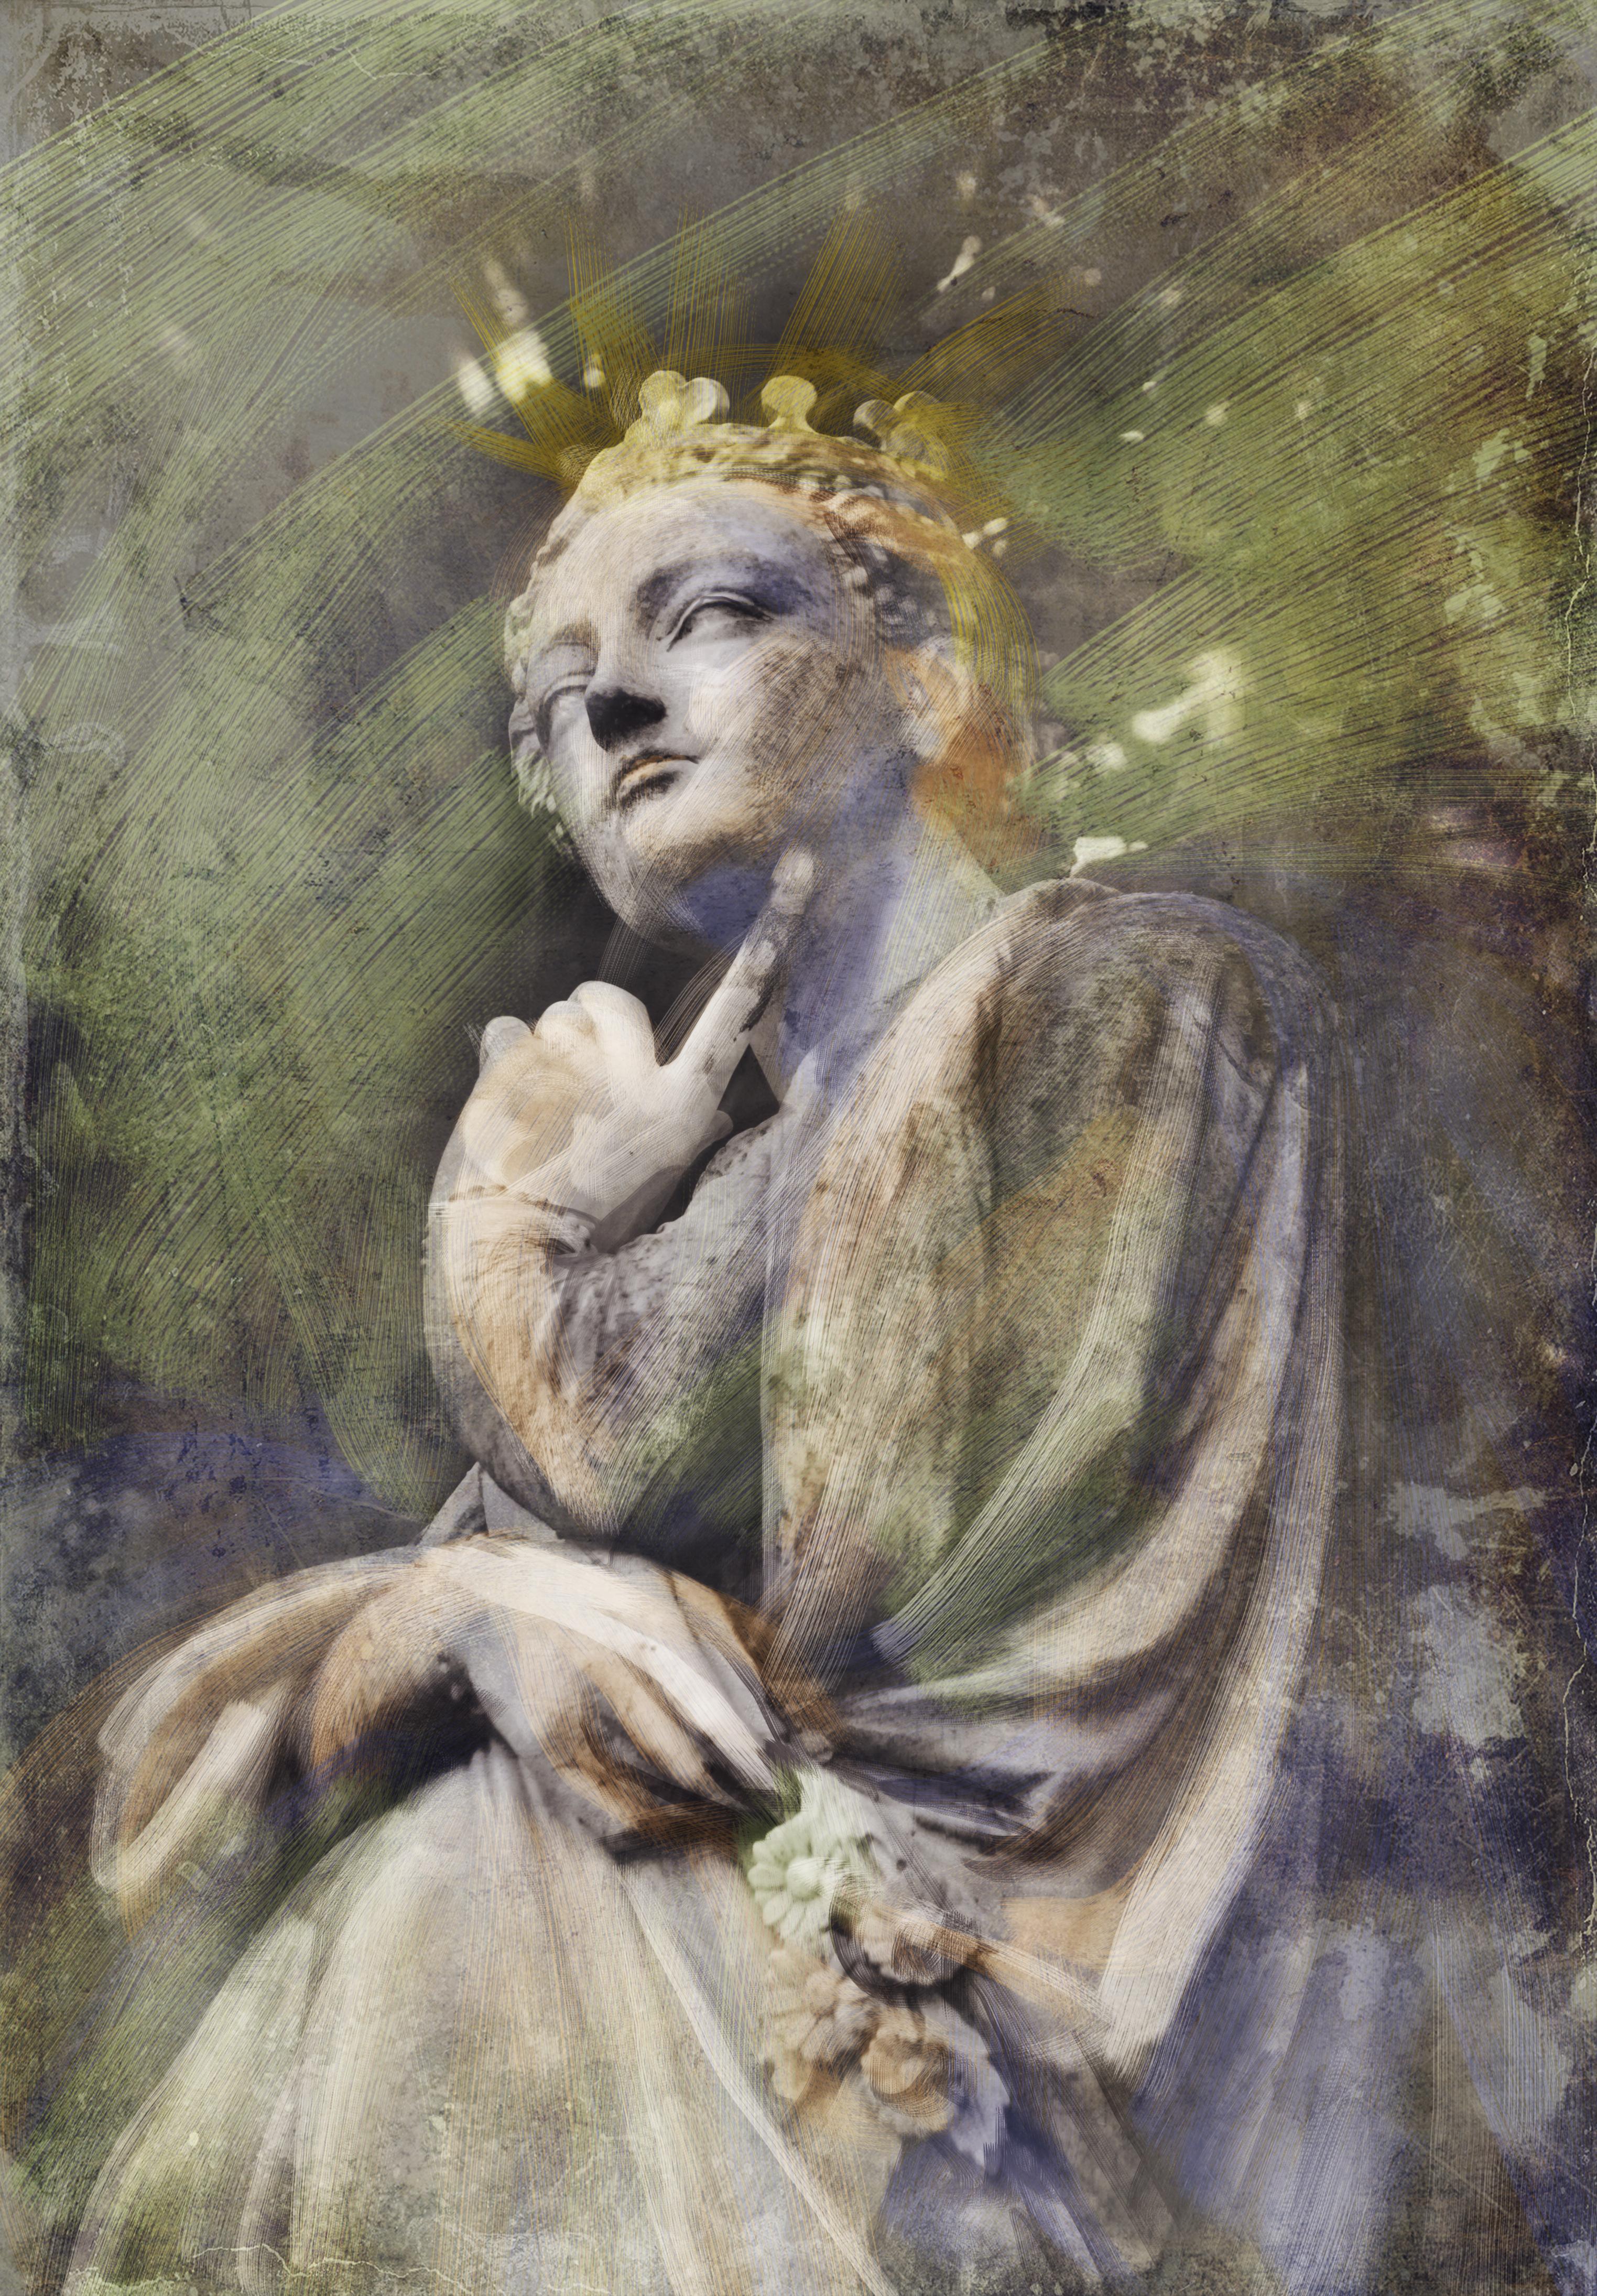 Jardin du Luxembourg stature - digital drawing